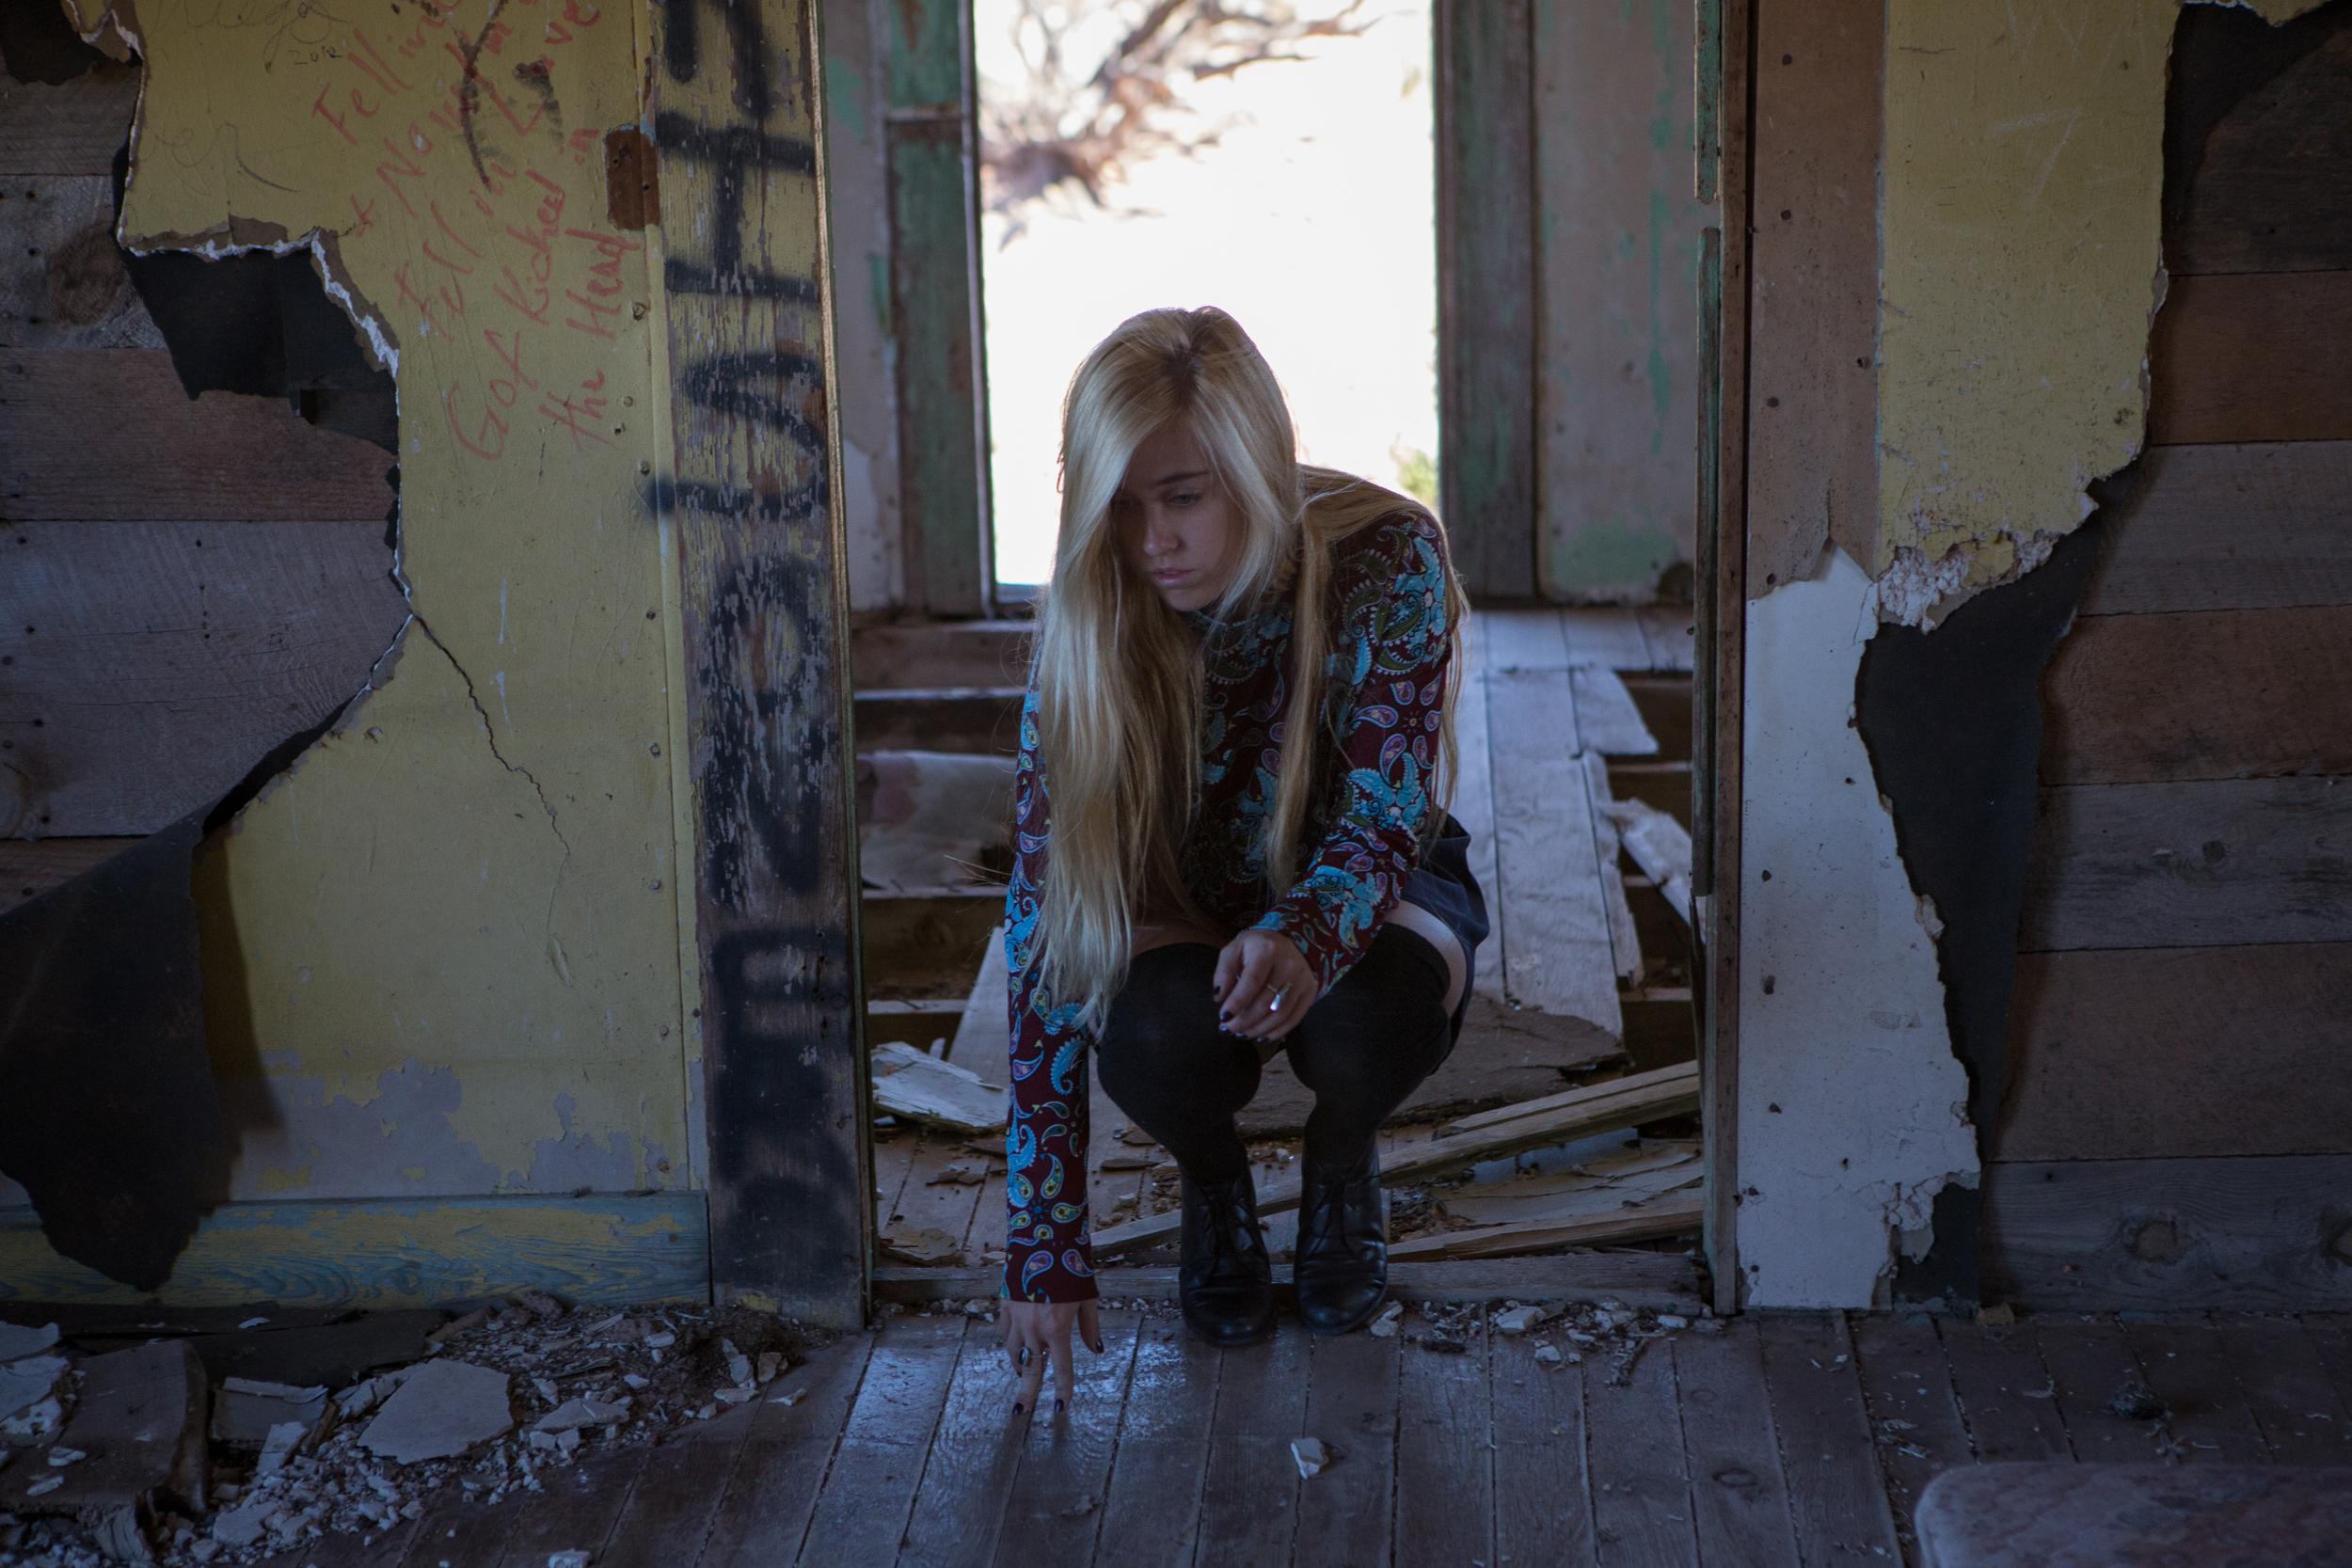 AstroBandit_Abandoned_Paisley_Fashion_Blogger_2.jpg